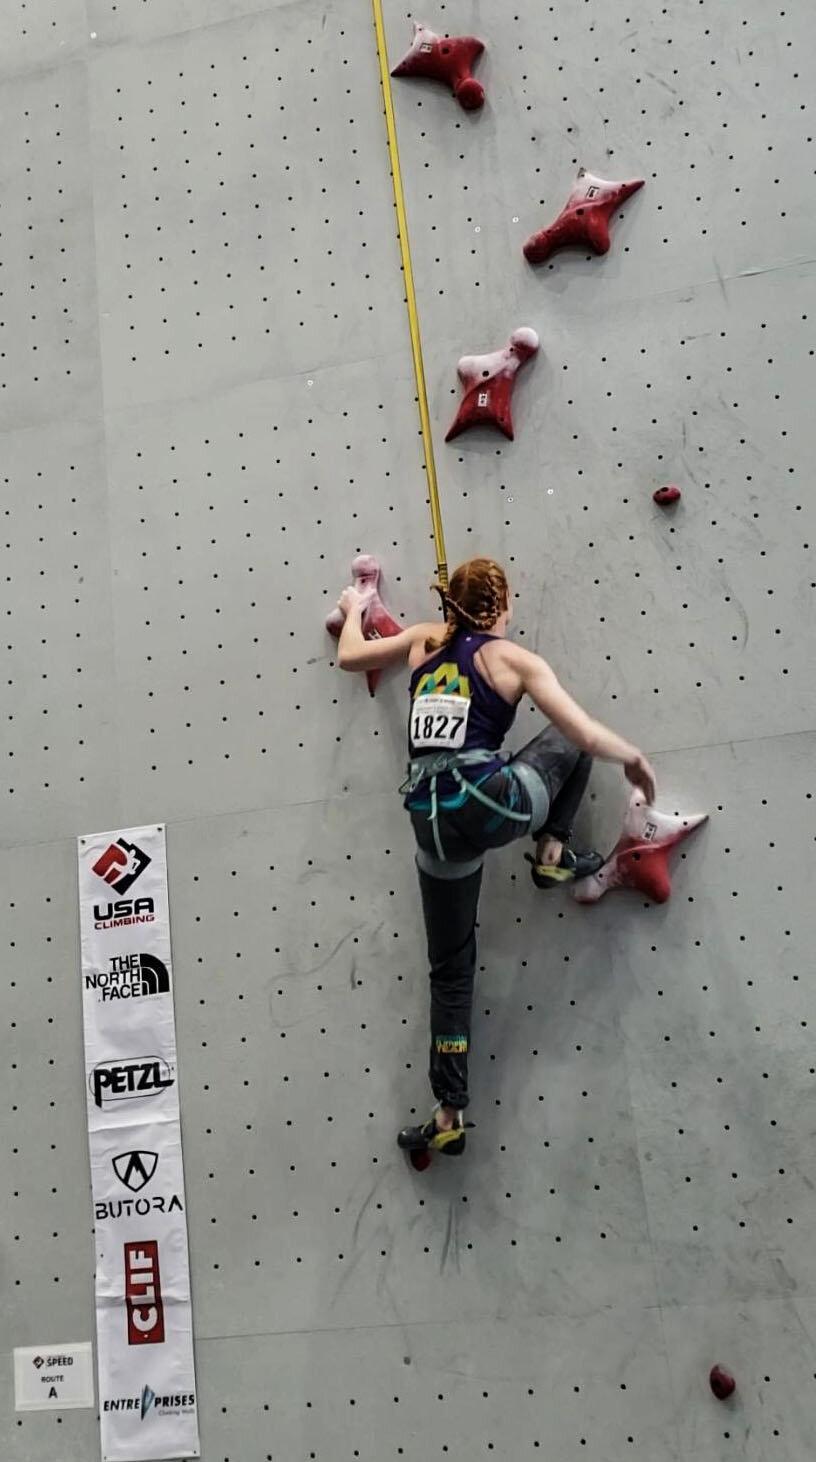 Aubrey speed climbing at Nationals.